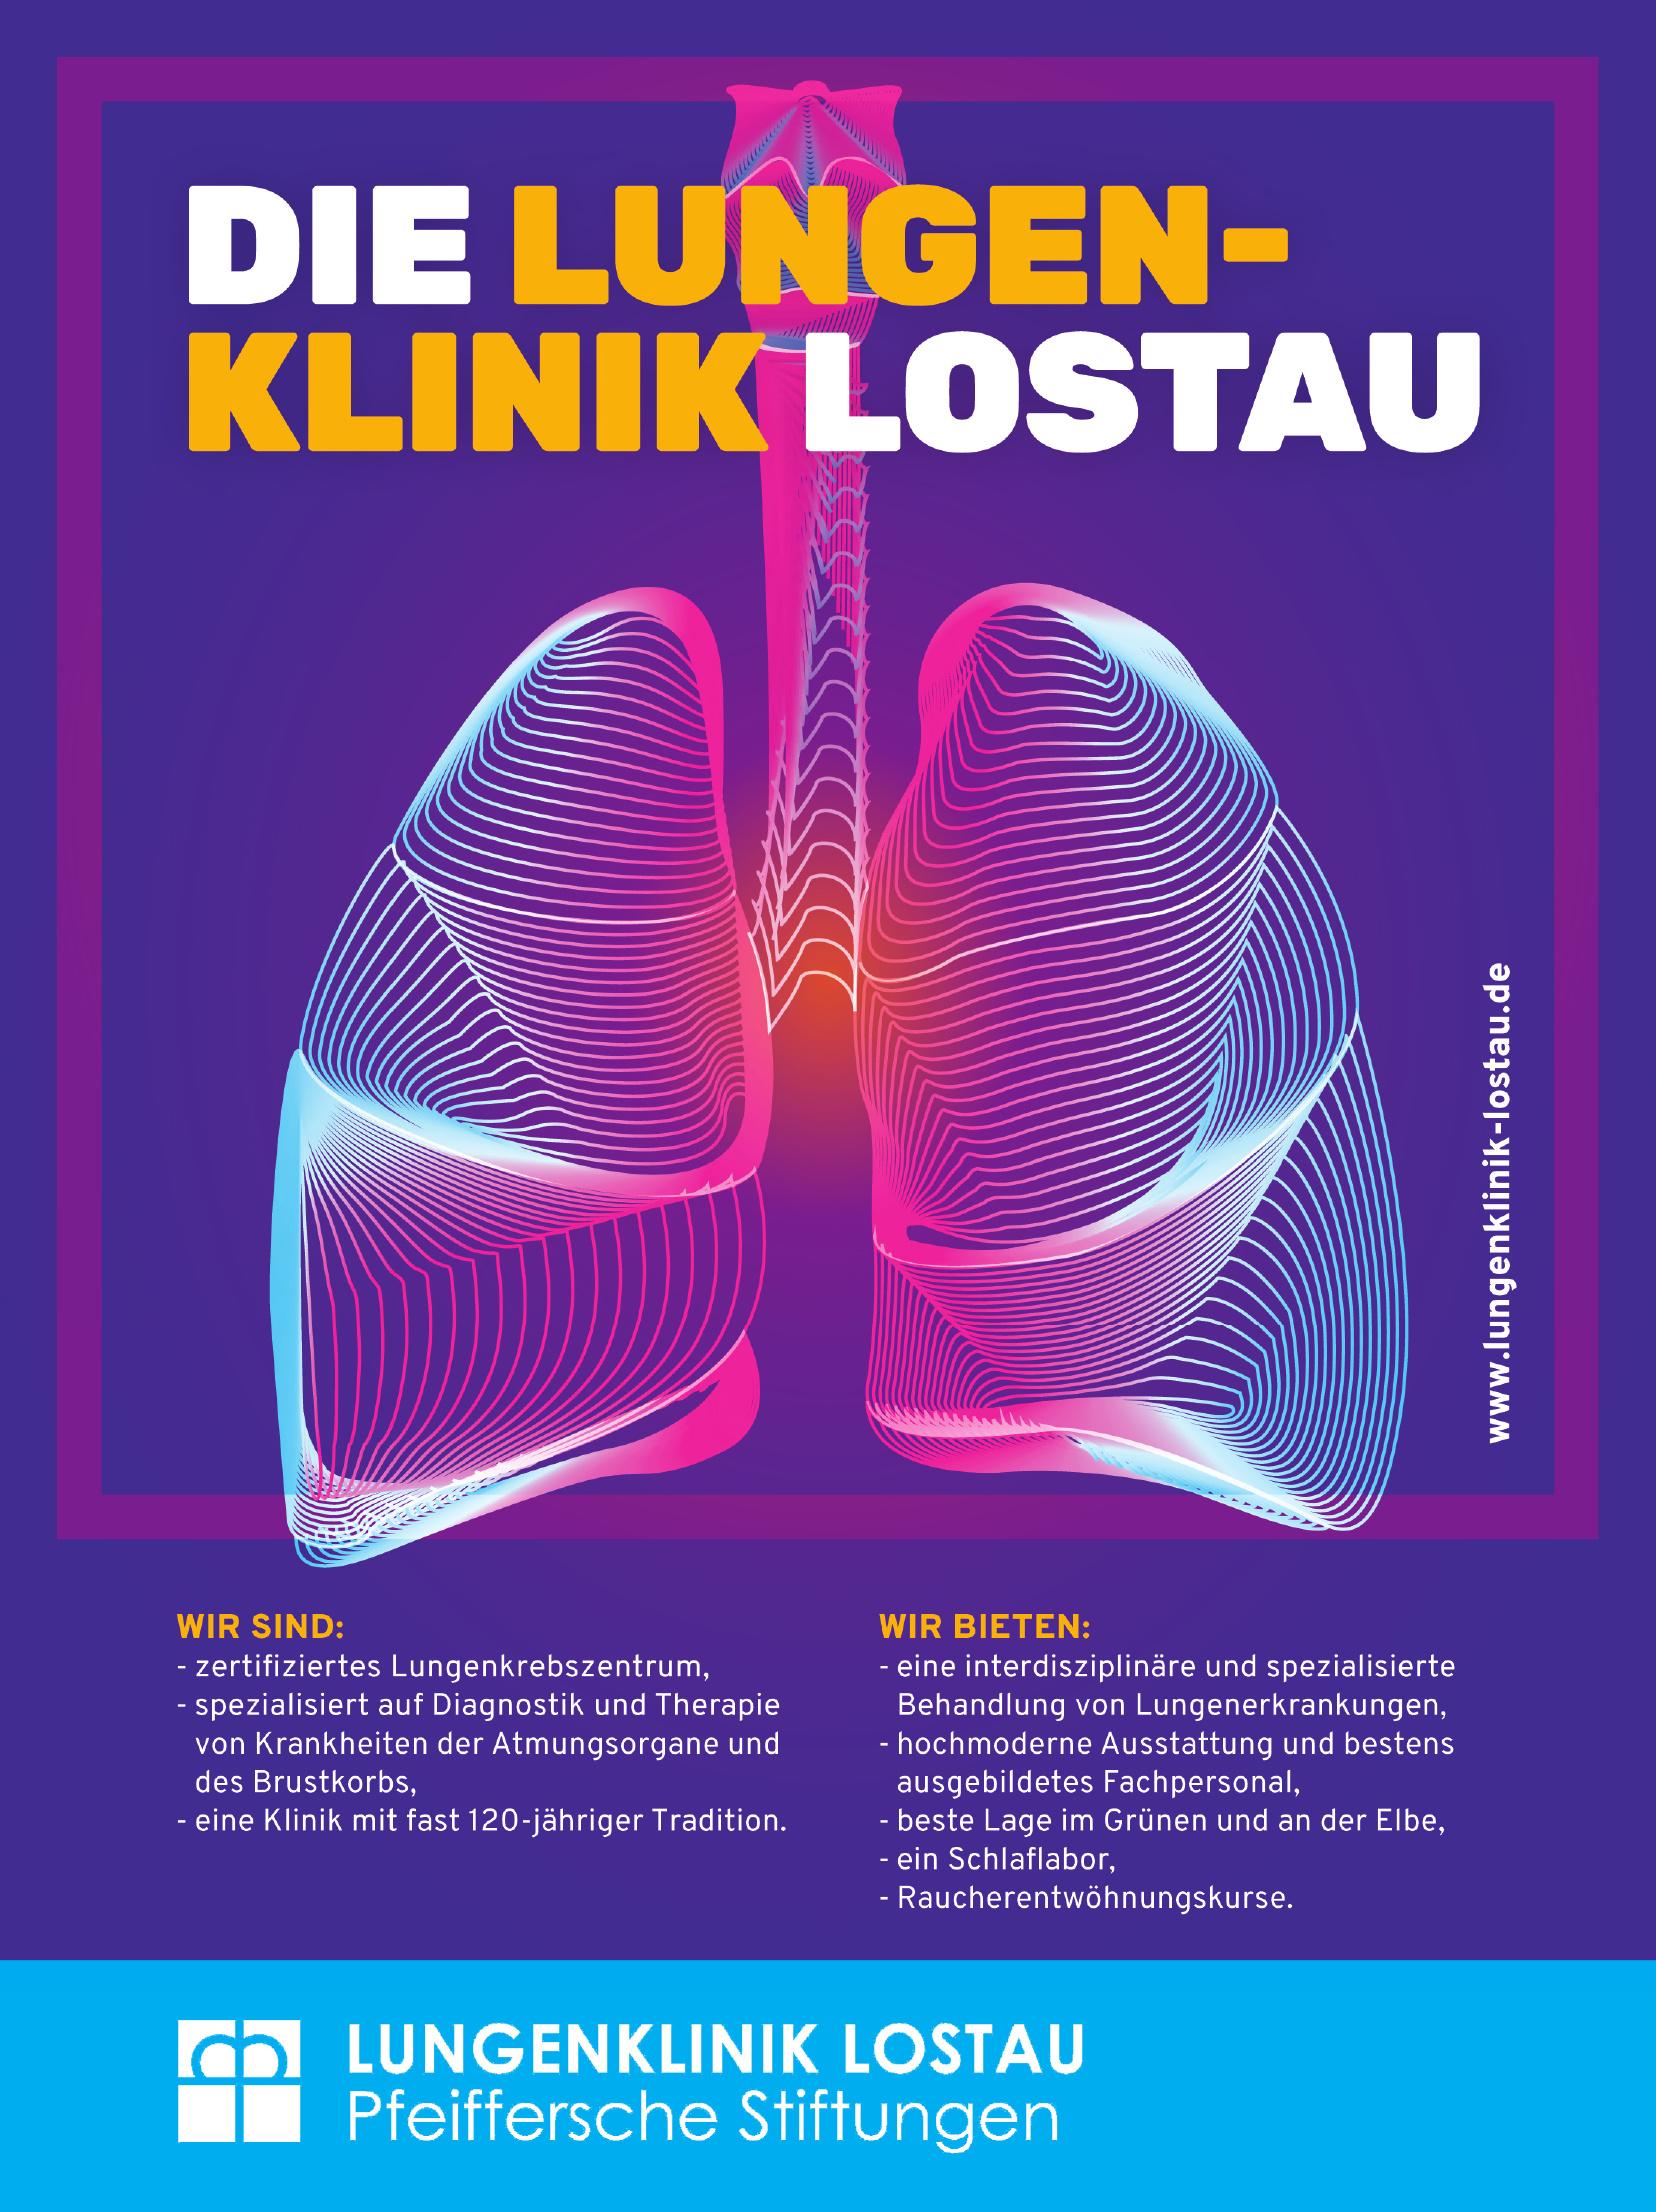 Lungenklinik Lostau